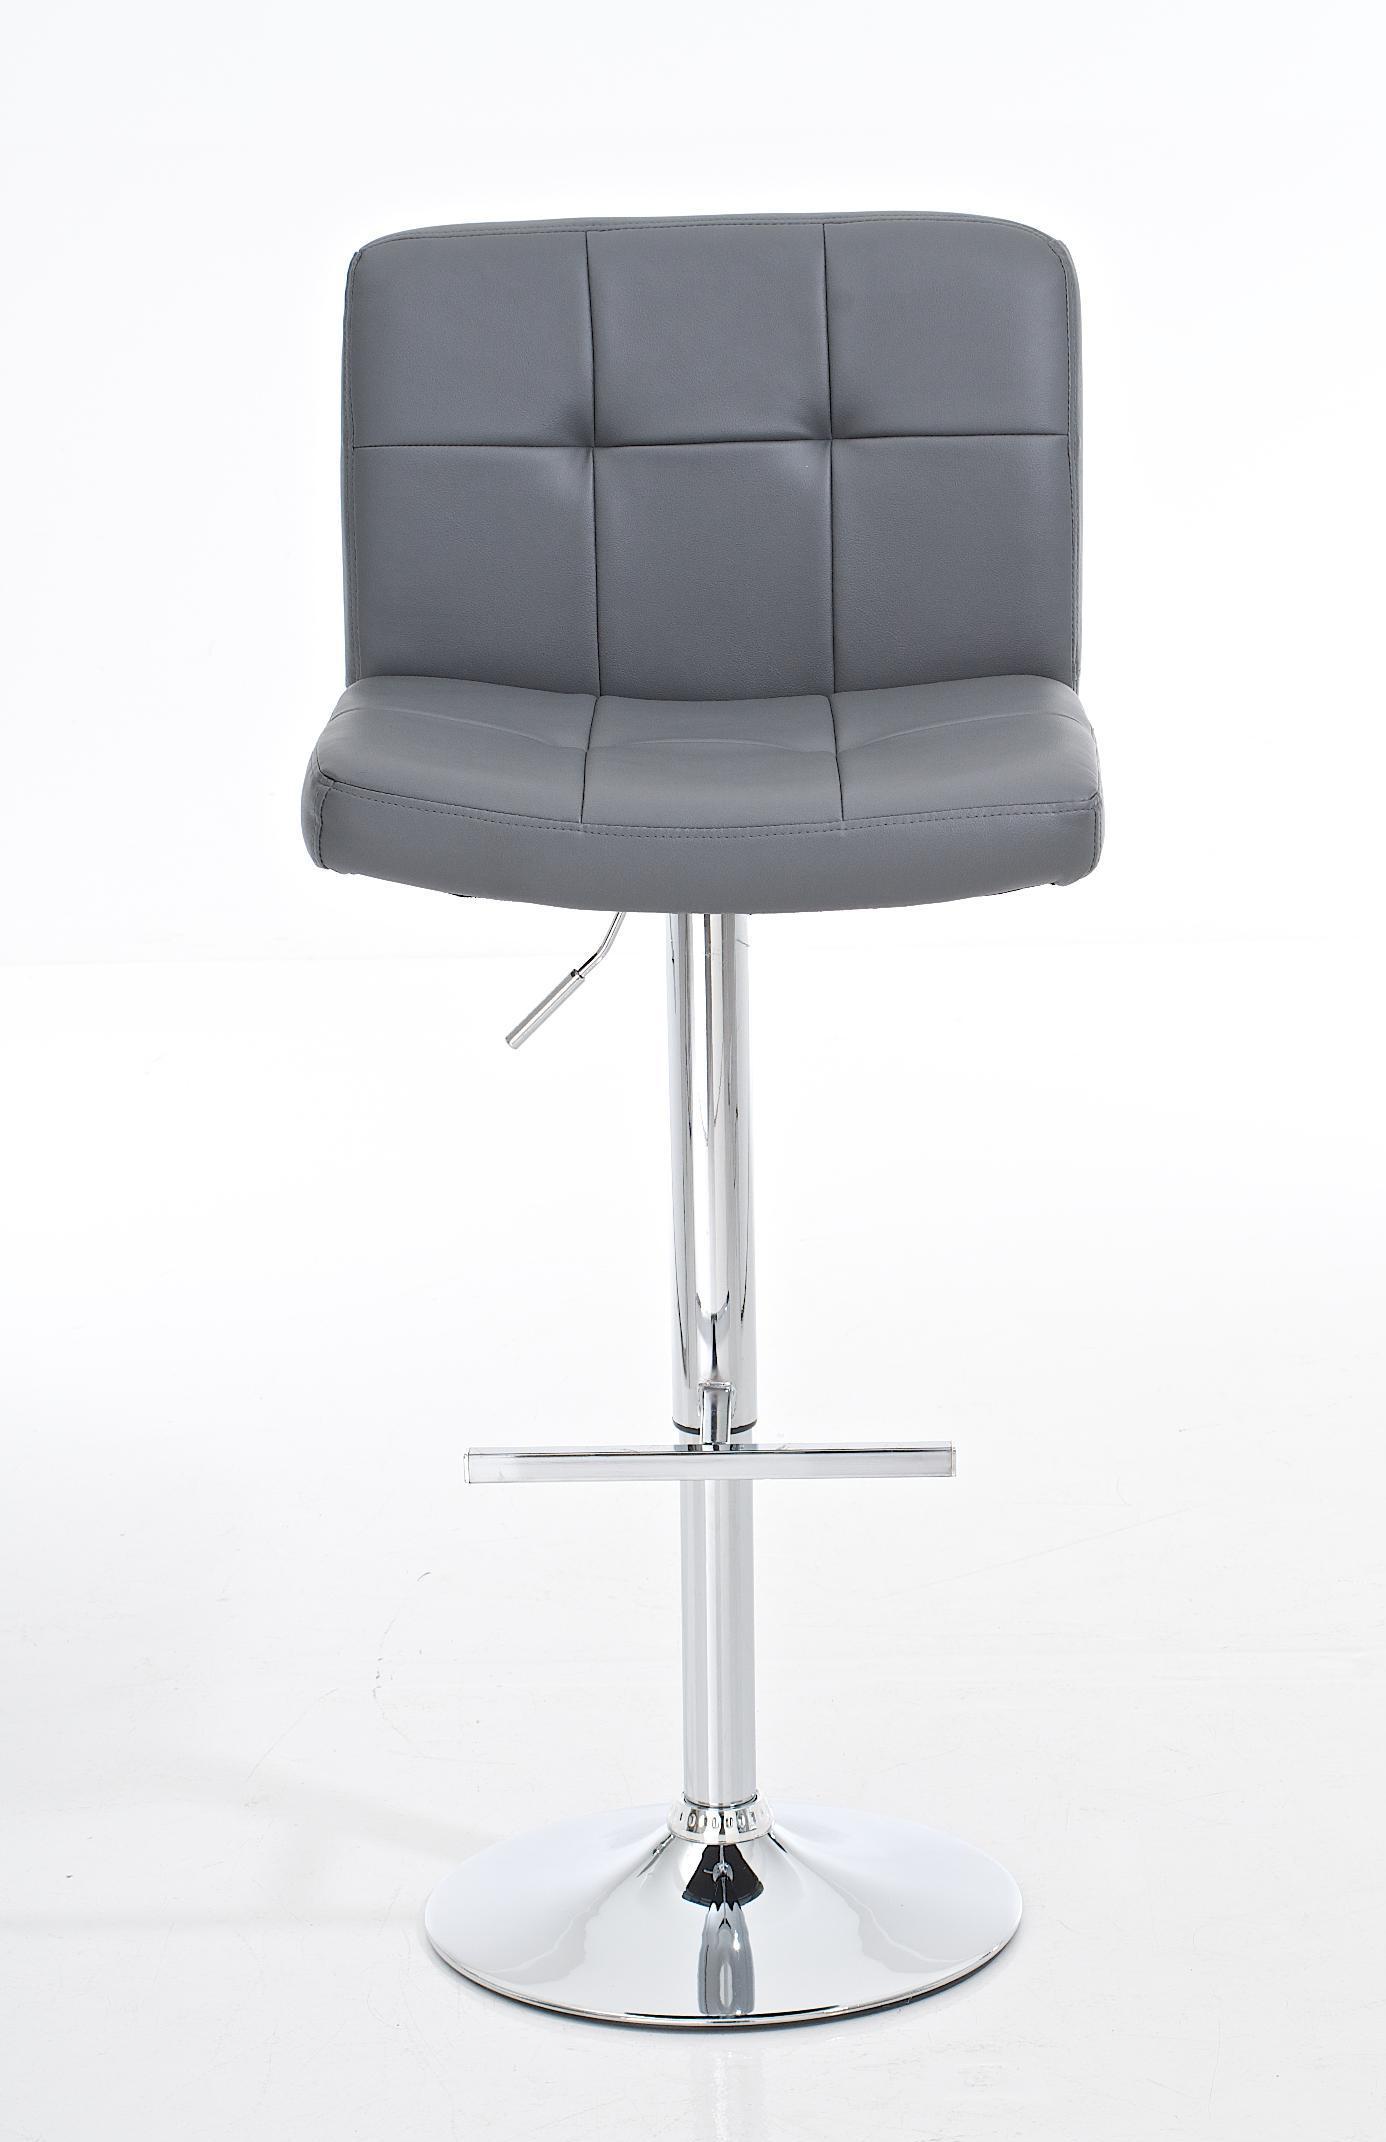 barhocker lissabon mit lehne hocker stuhl tresenhocker kunstleder farbauswahl ebay. Black Bedroom Furniture Sets. Home Design Ideas